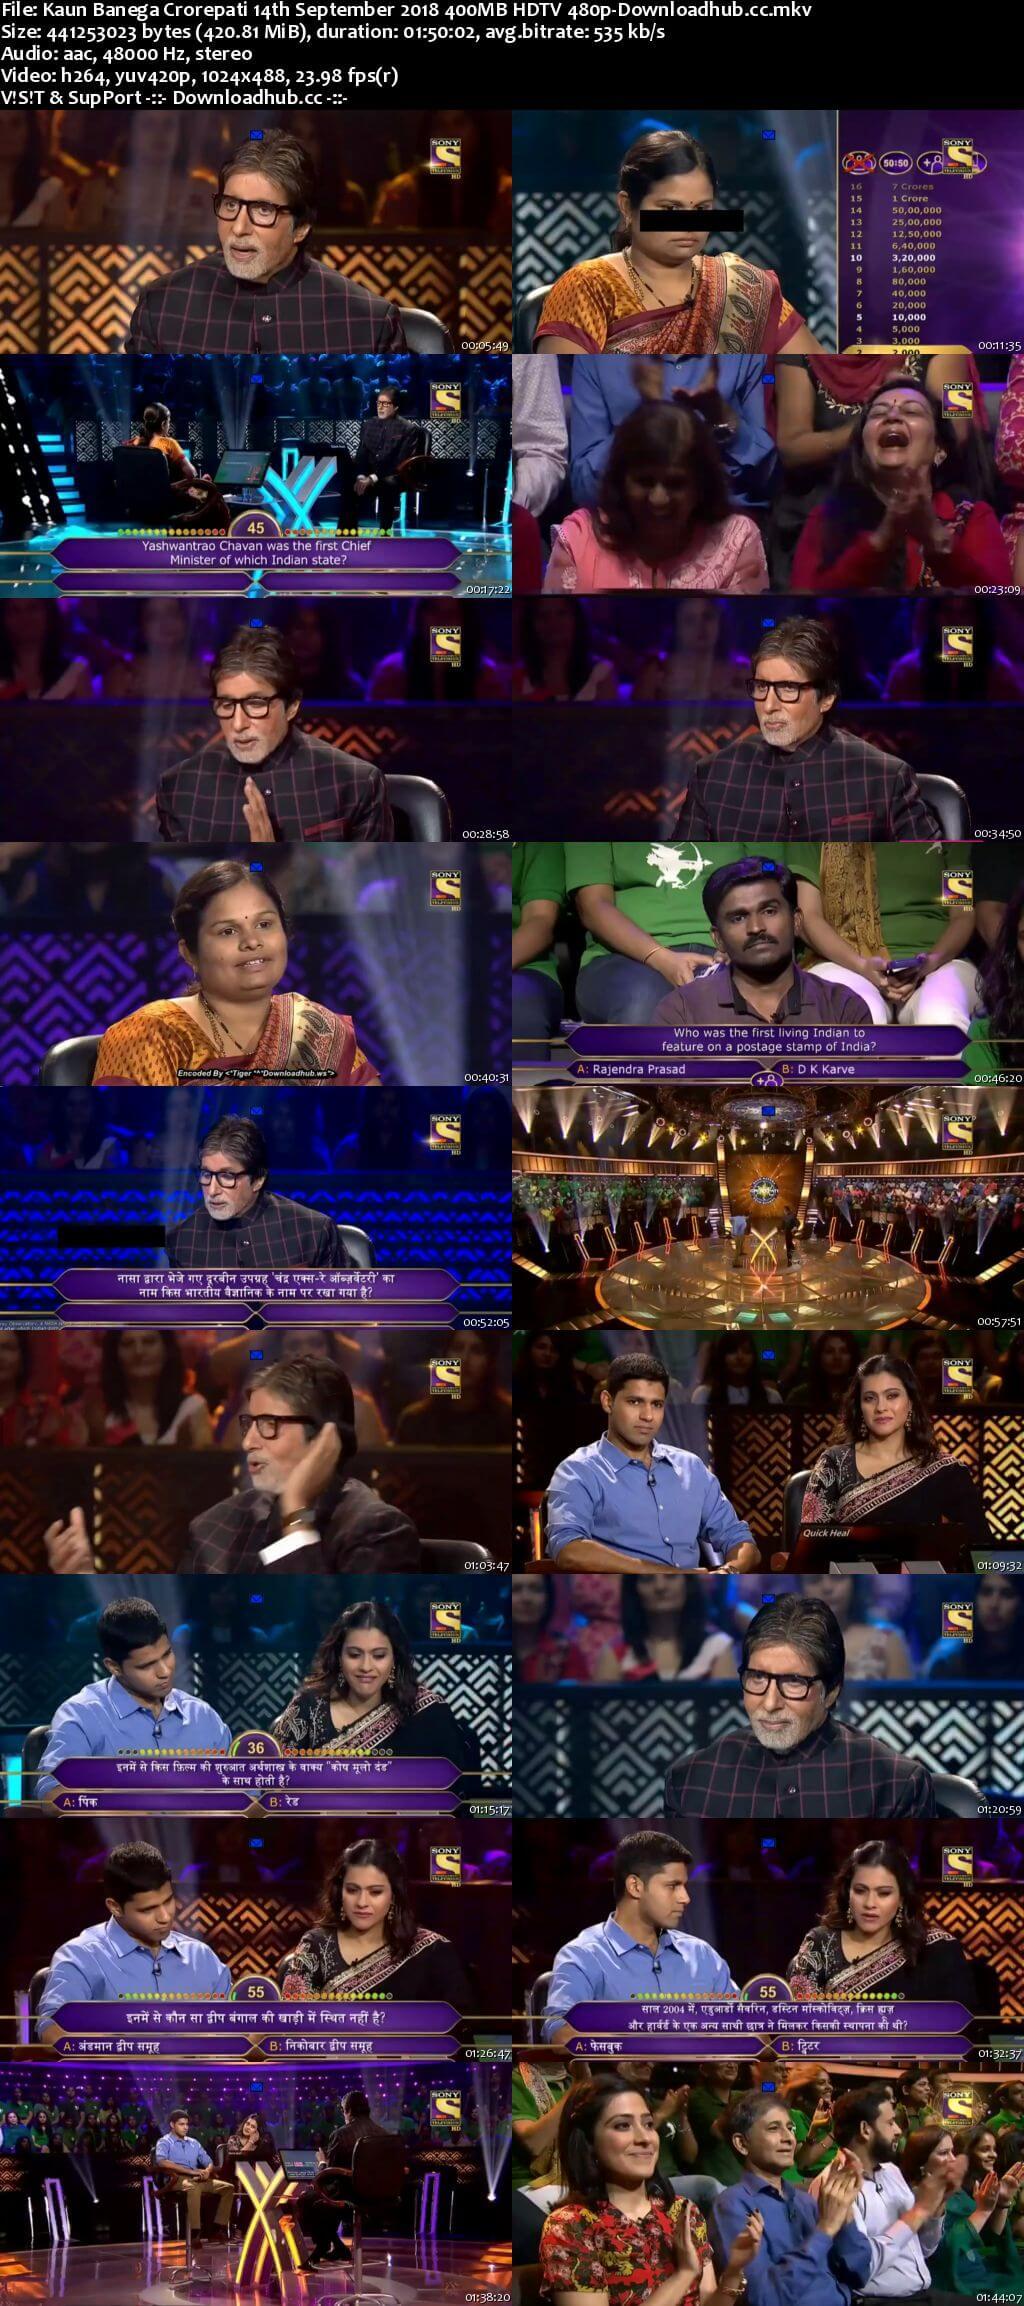 Kaun Banega Crorepati 14th September 2018 400MB HDTV 480p